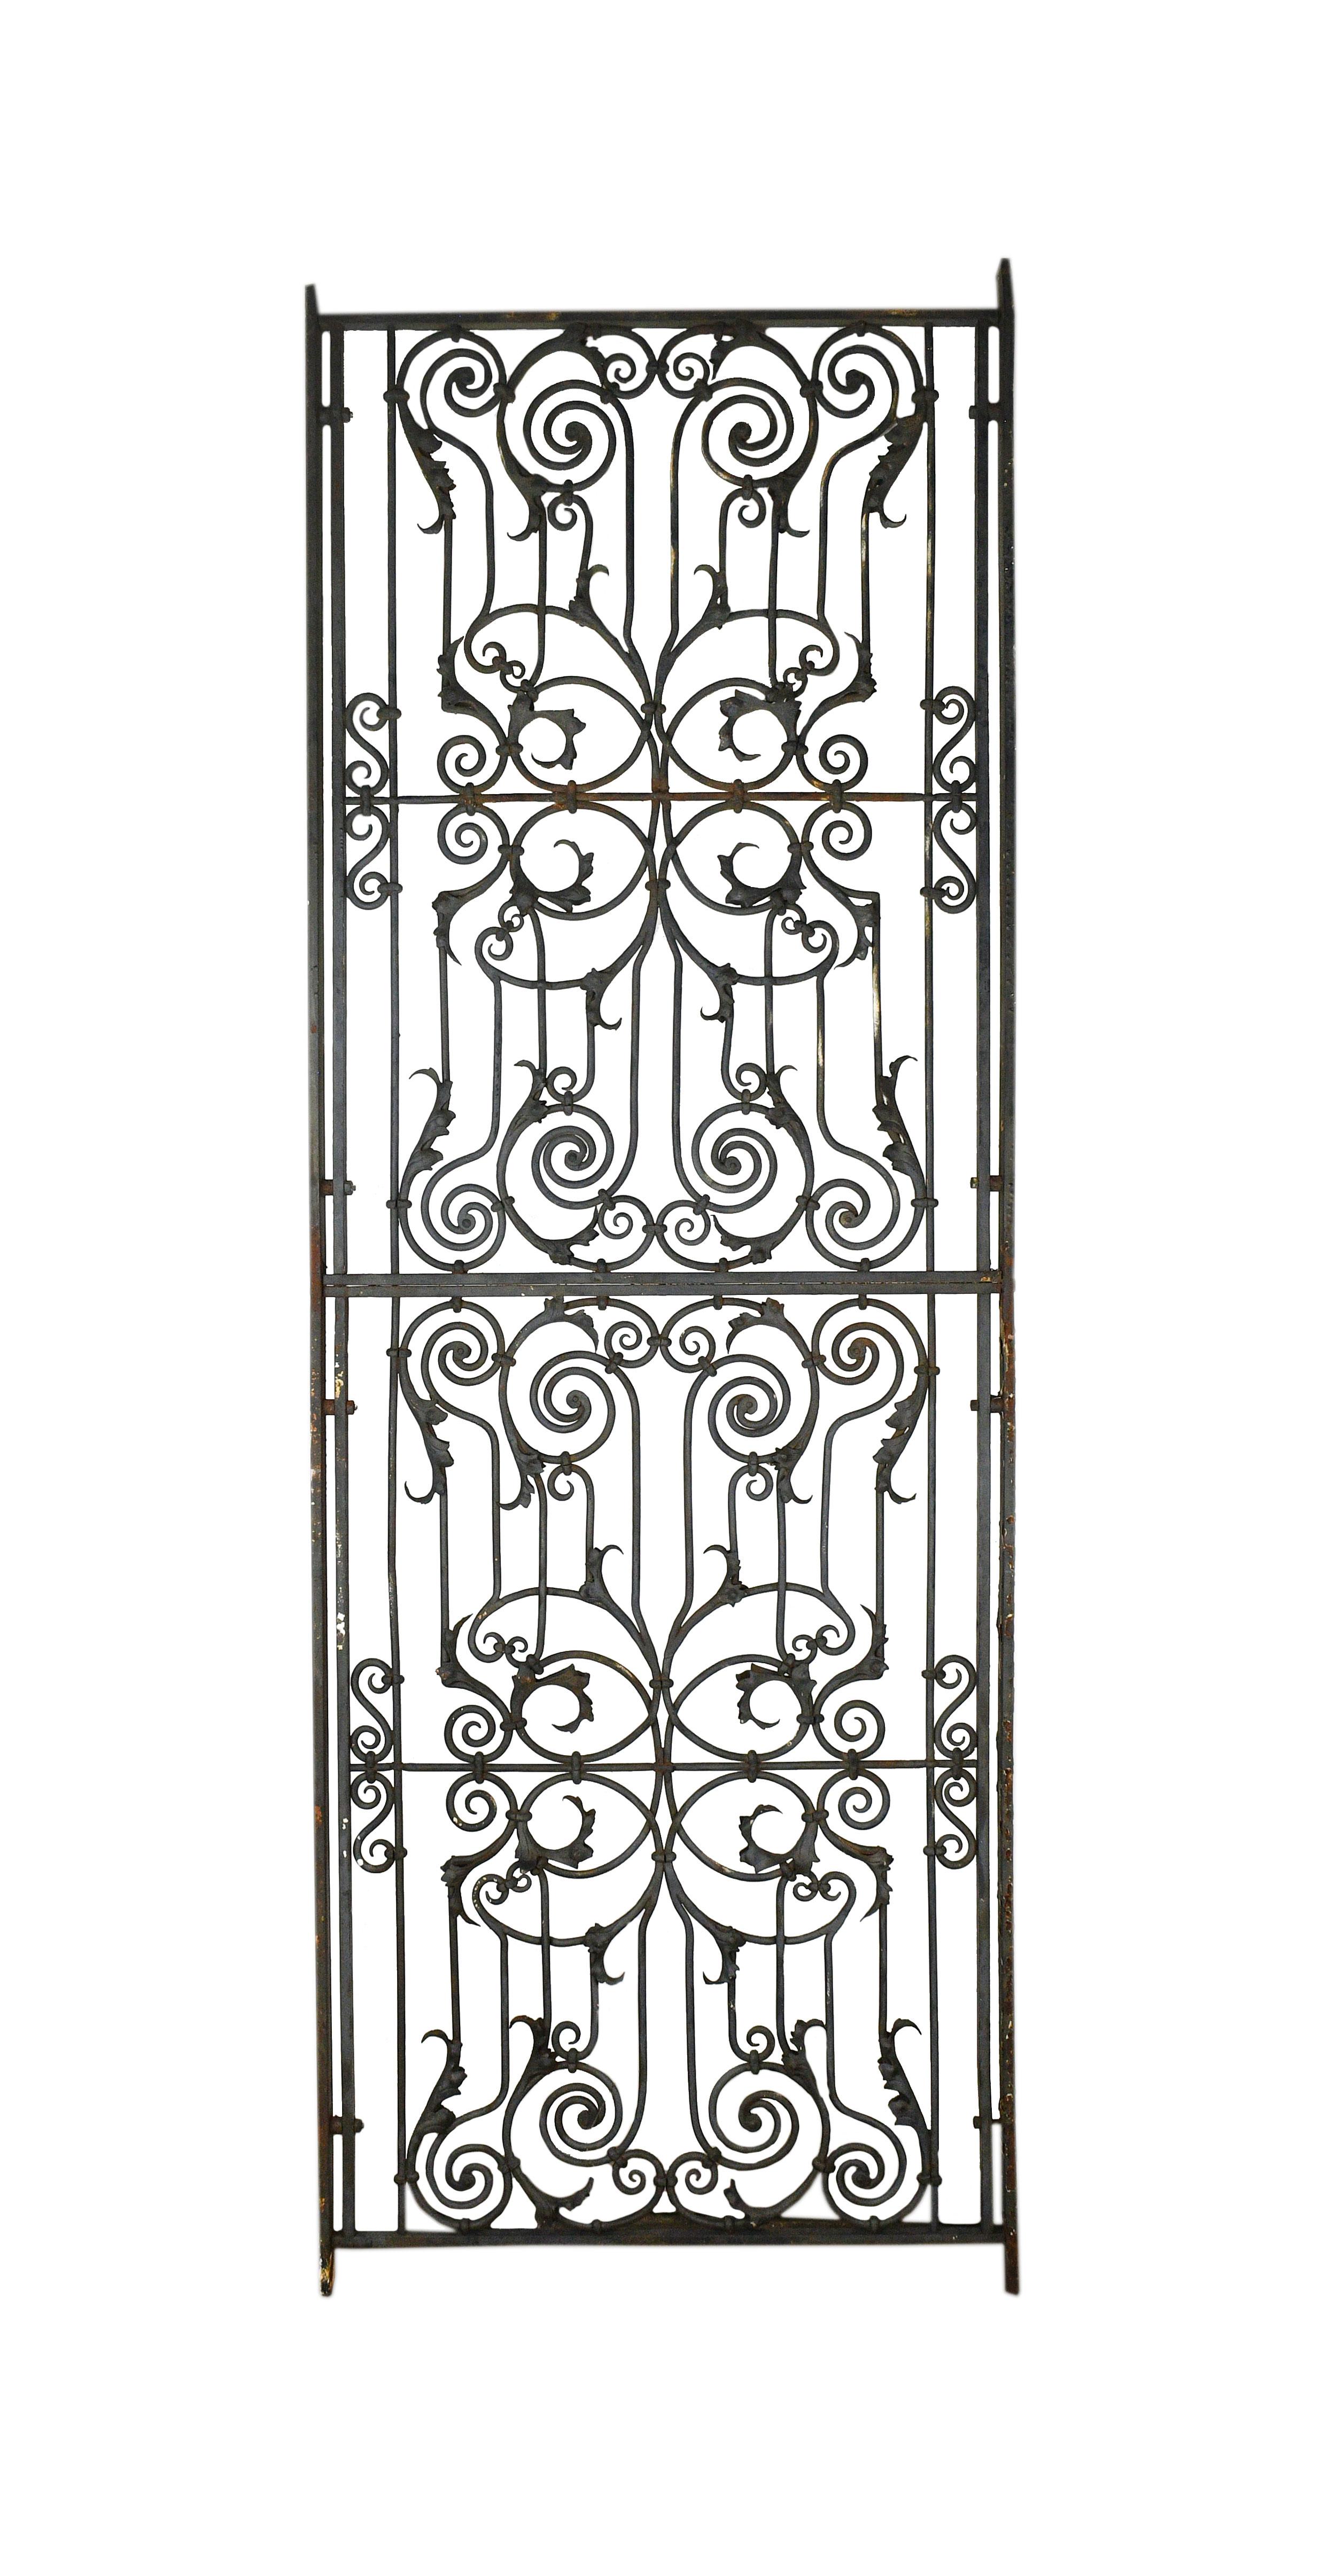 48309-iron-gate-3.jpg